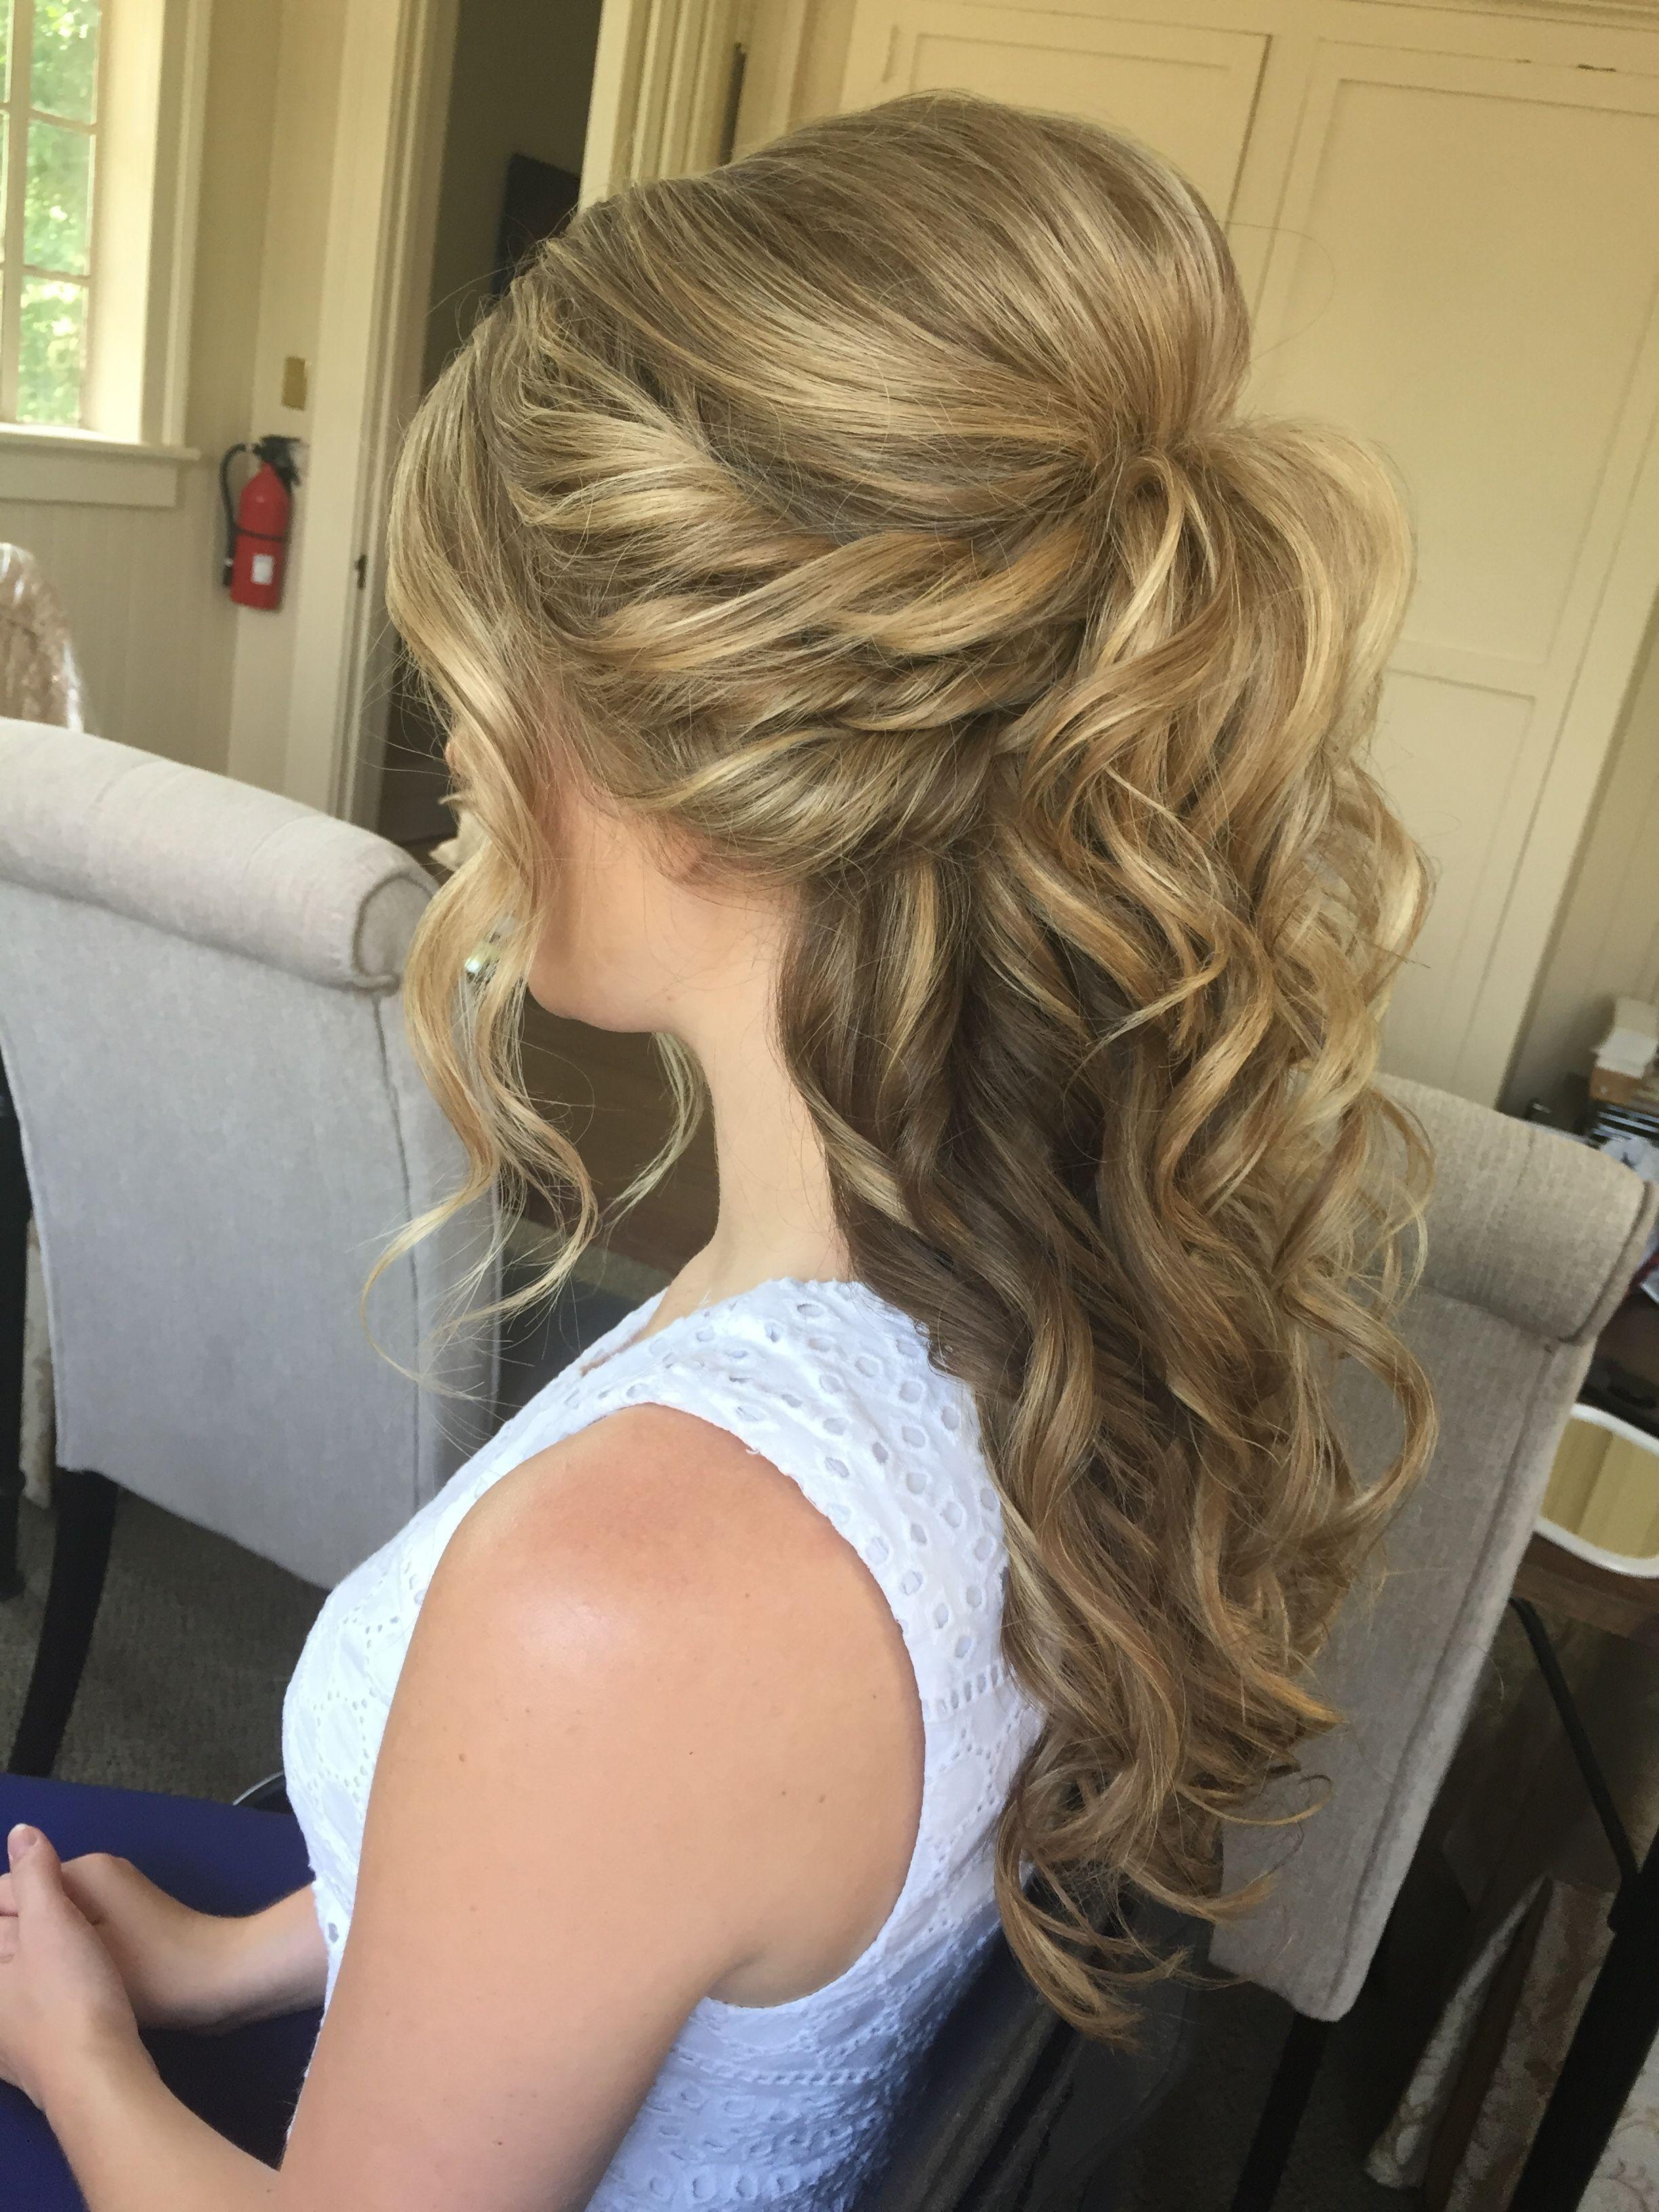 Explore Gallery Of Half Up Half Down Wedding Hairstyles For Medium Length Hair 7 Of 15 Hair Styles Medium Length Hair Styles Wedding Hair Half